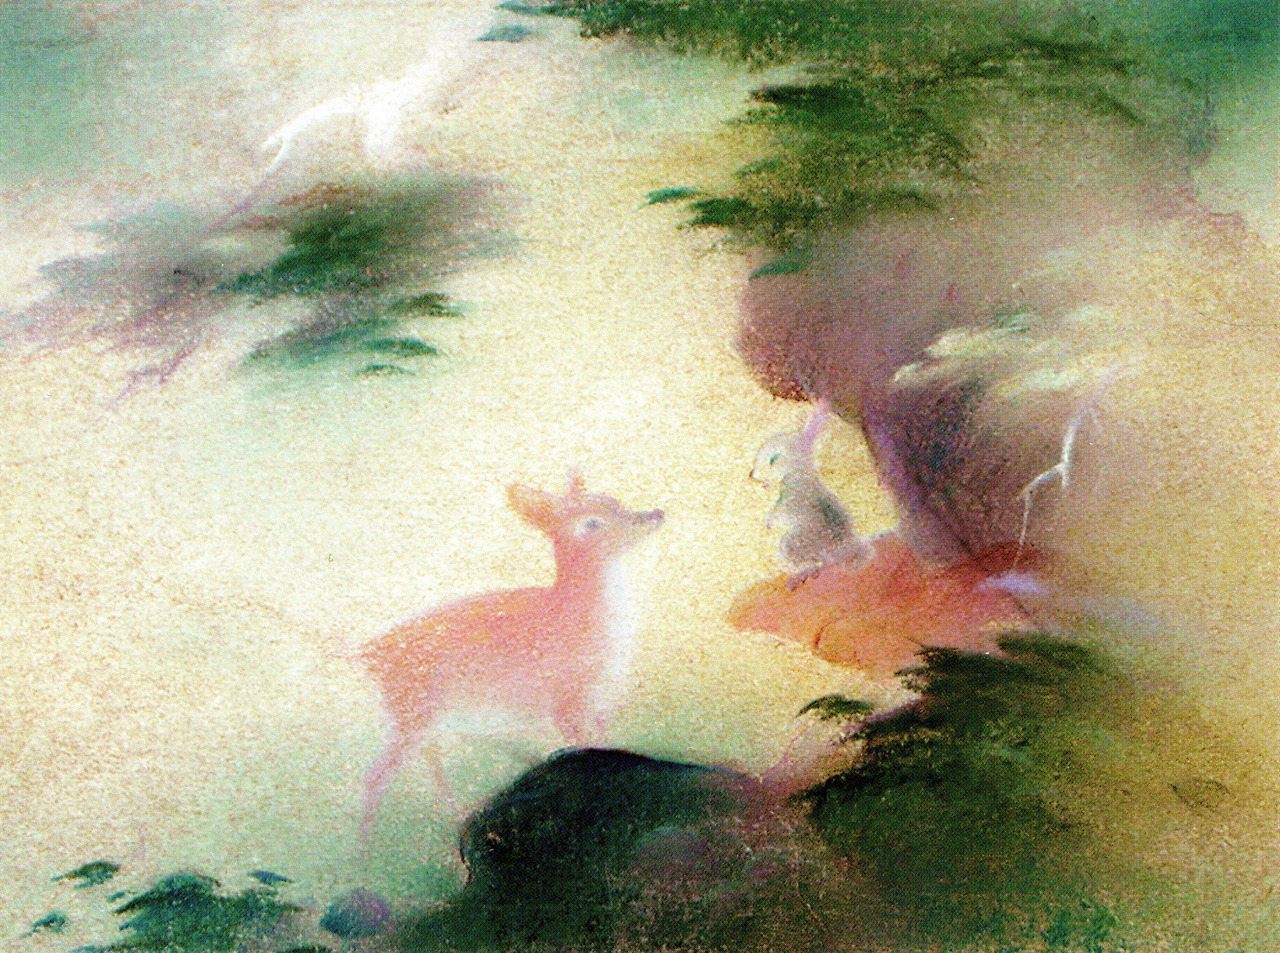 bambi_art_3.jpg